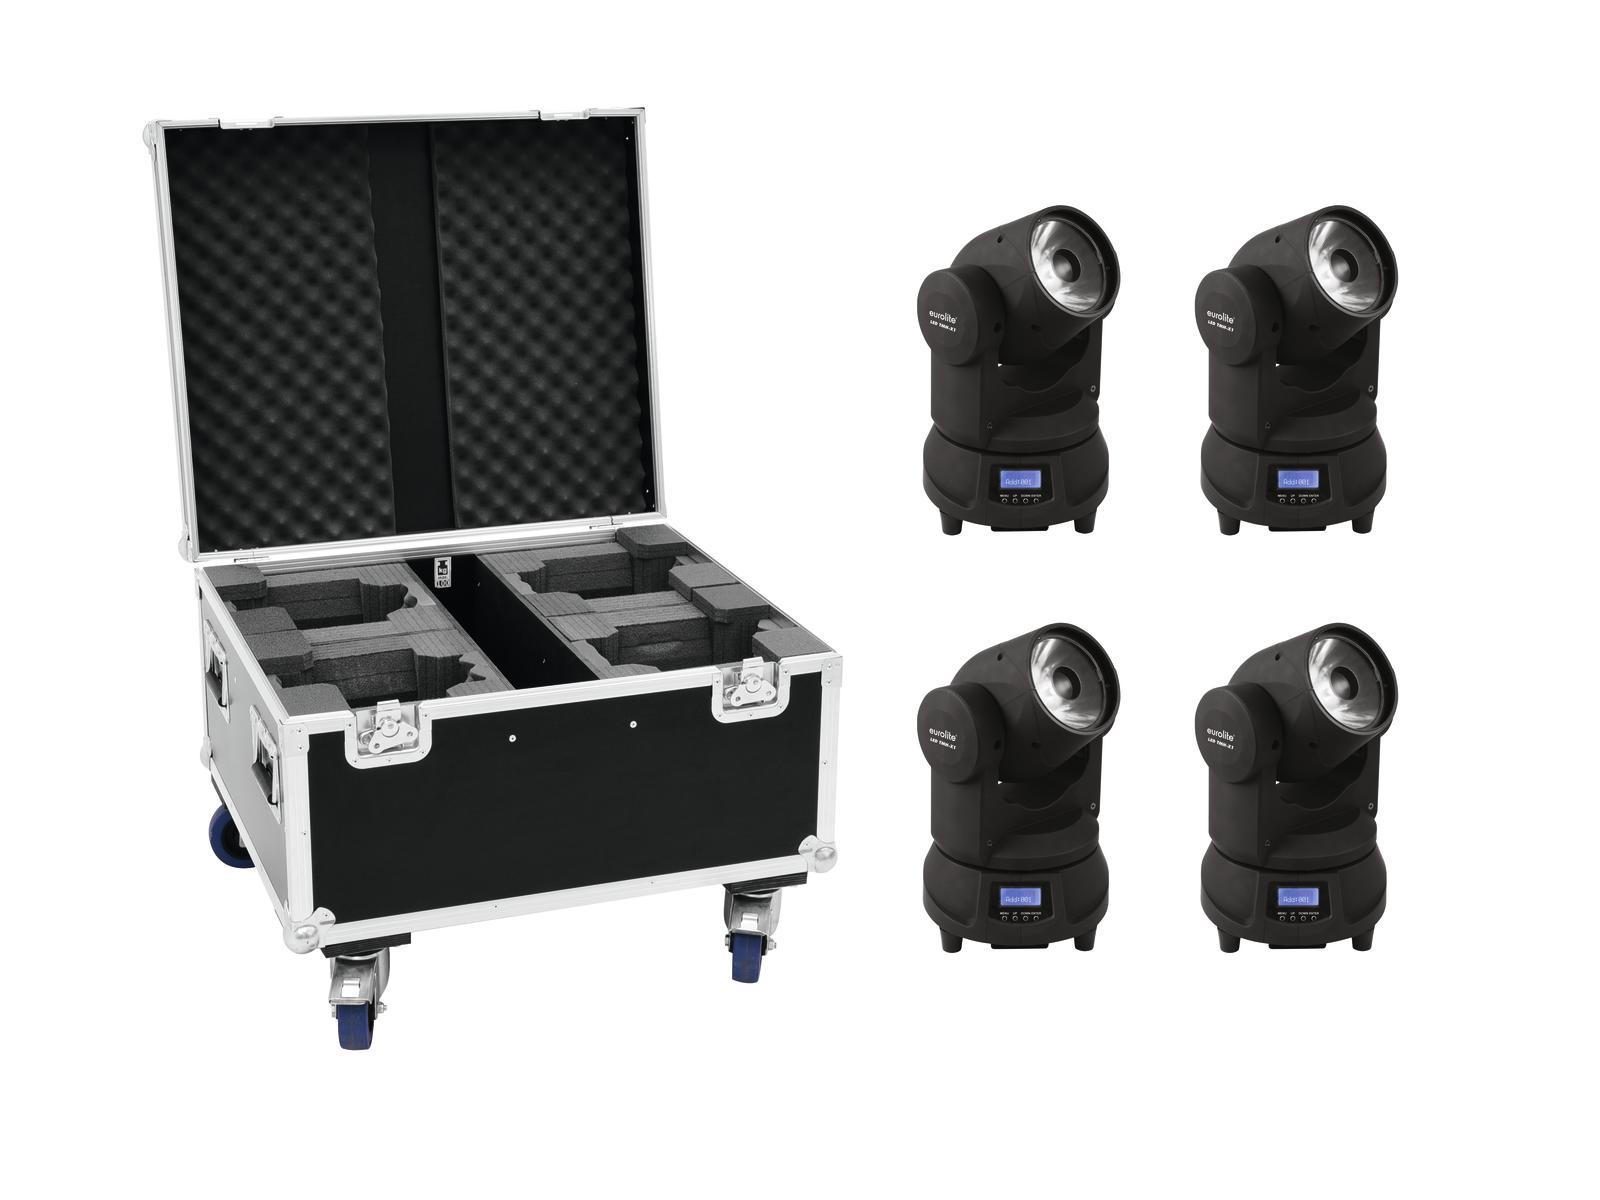 eurolite-set-4x-led-tmh-x1-moving-head-beam-case